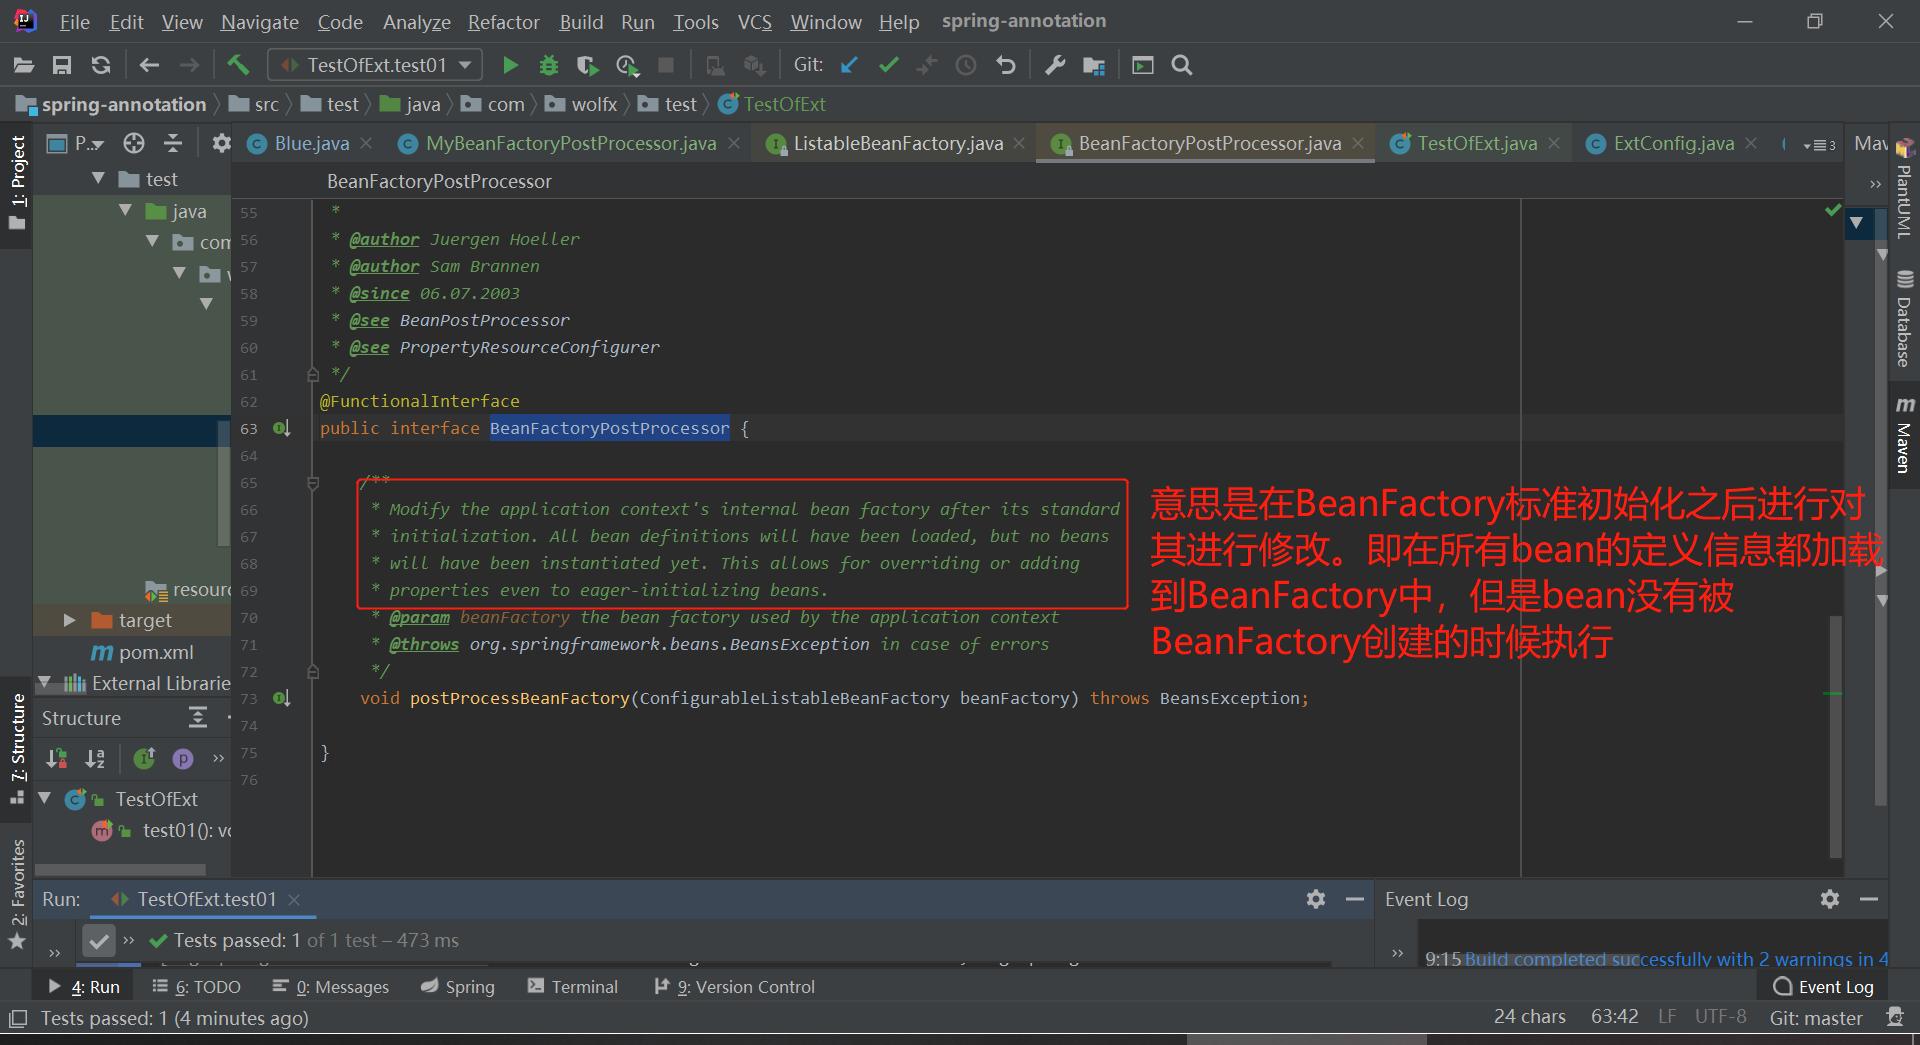 [spring annotation driven development] - BeanFactoryPostProcessor